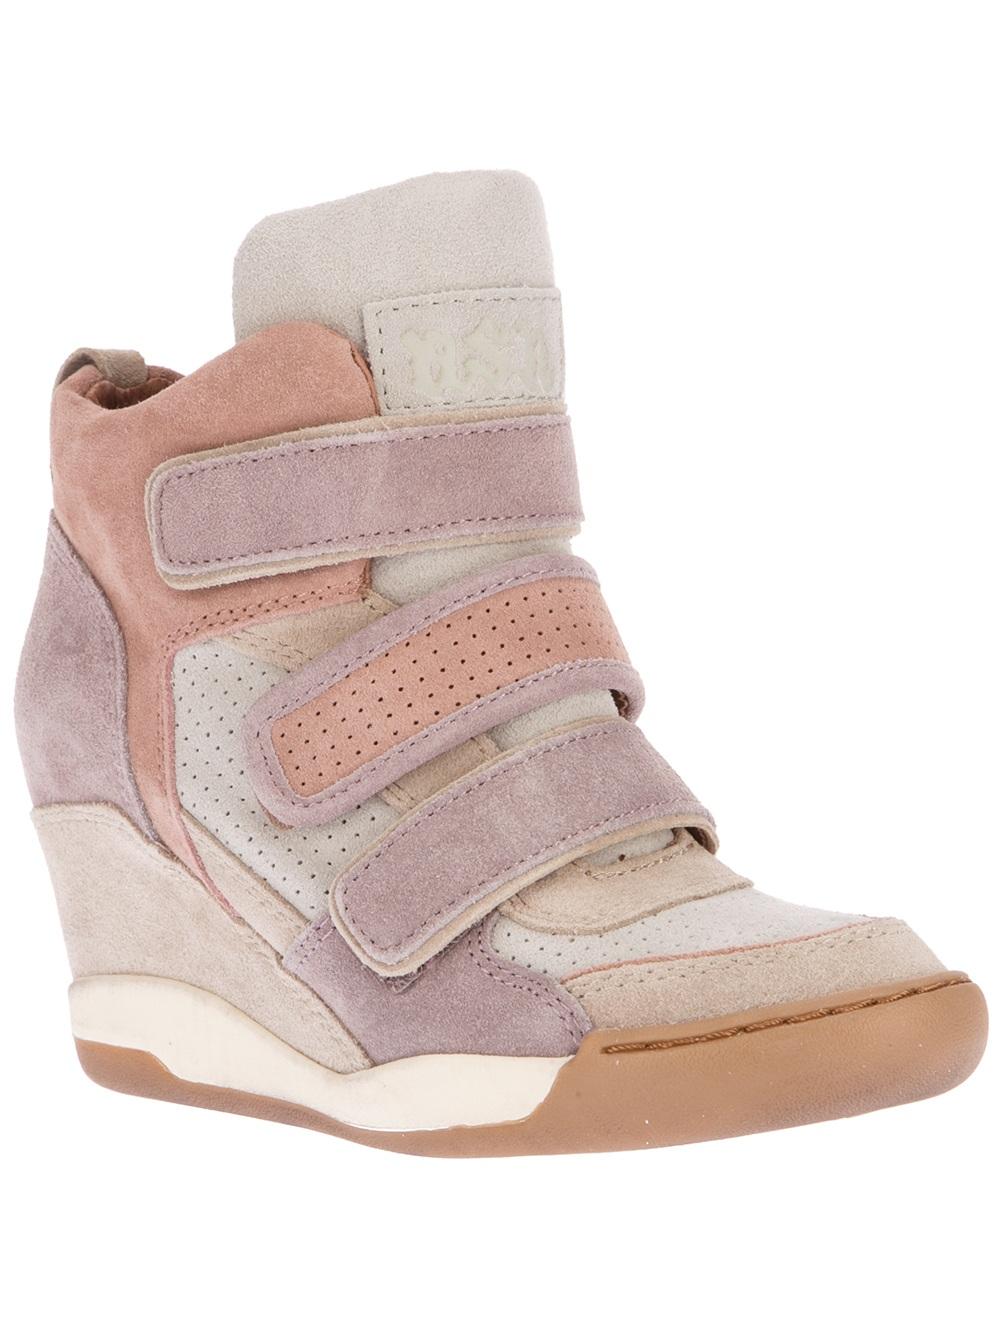 9e396548a Lyst - Ash Alex Wedge Sneaker in Pink